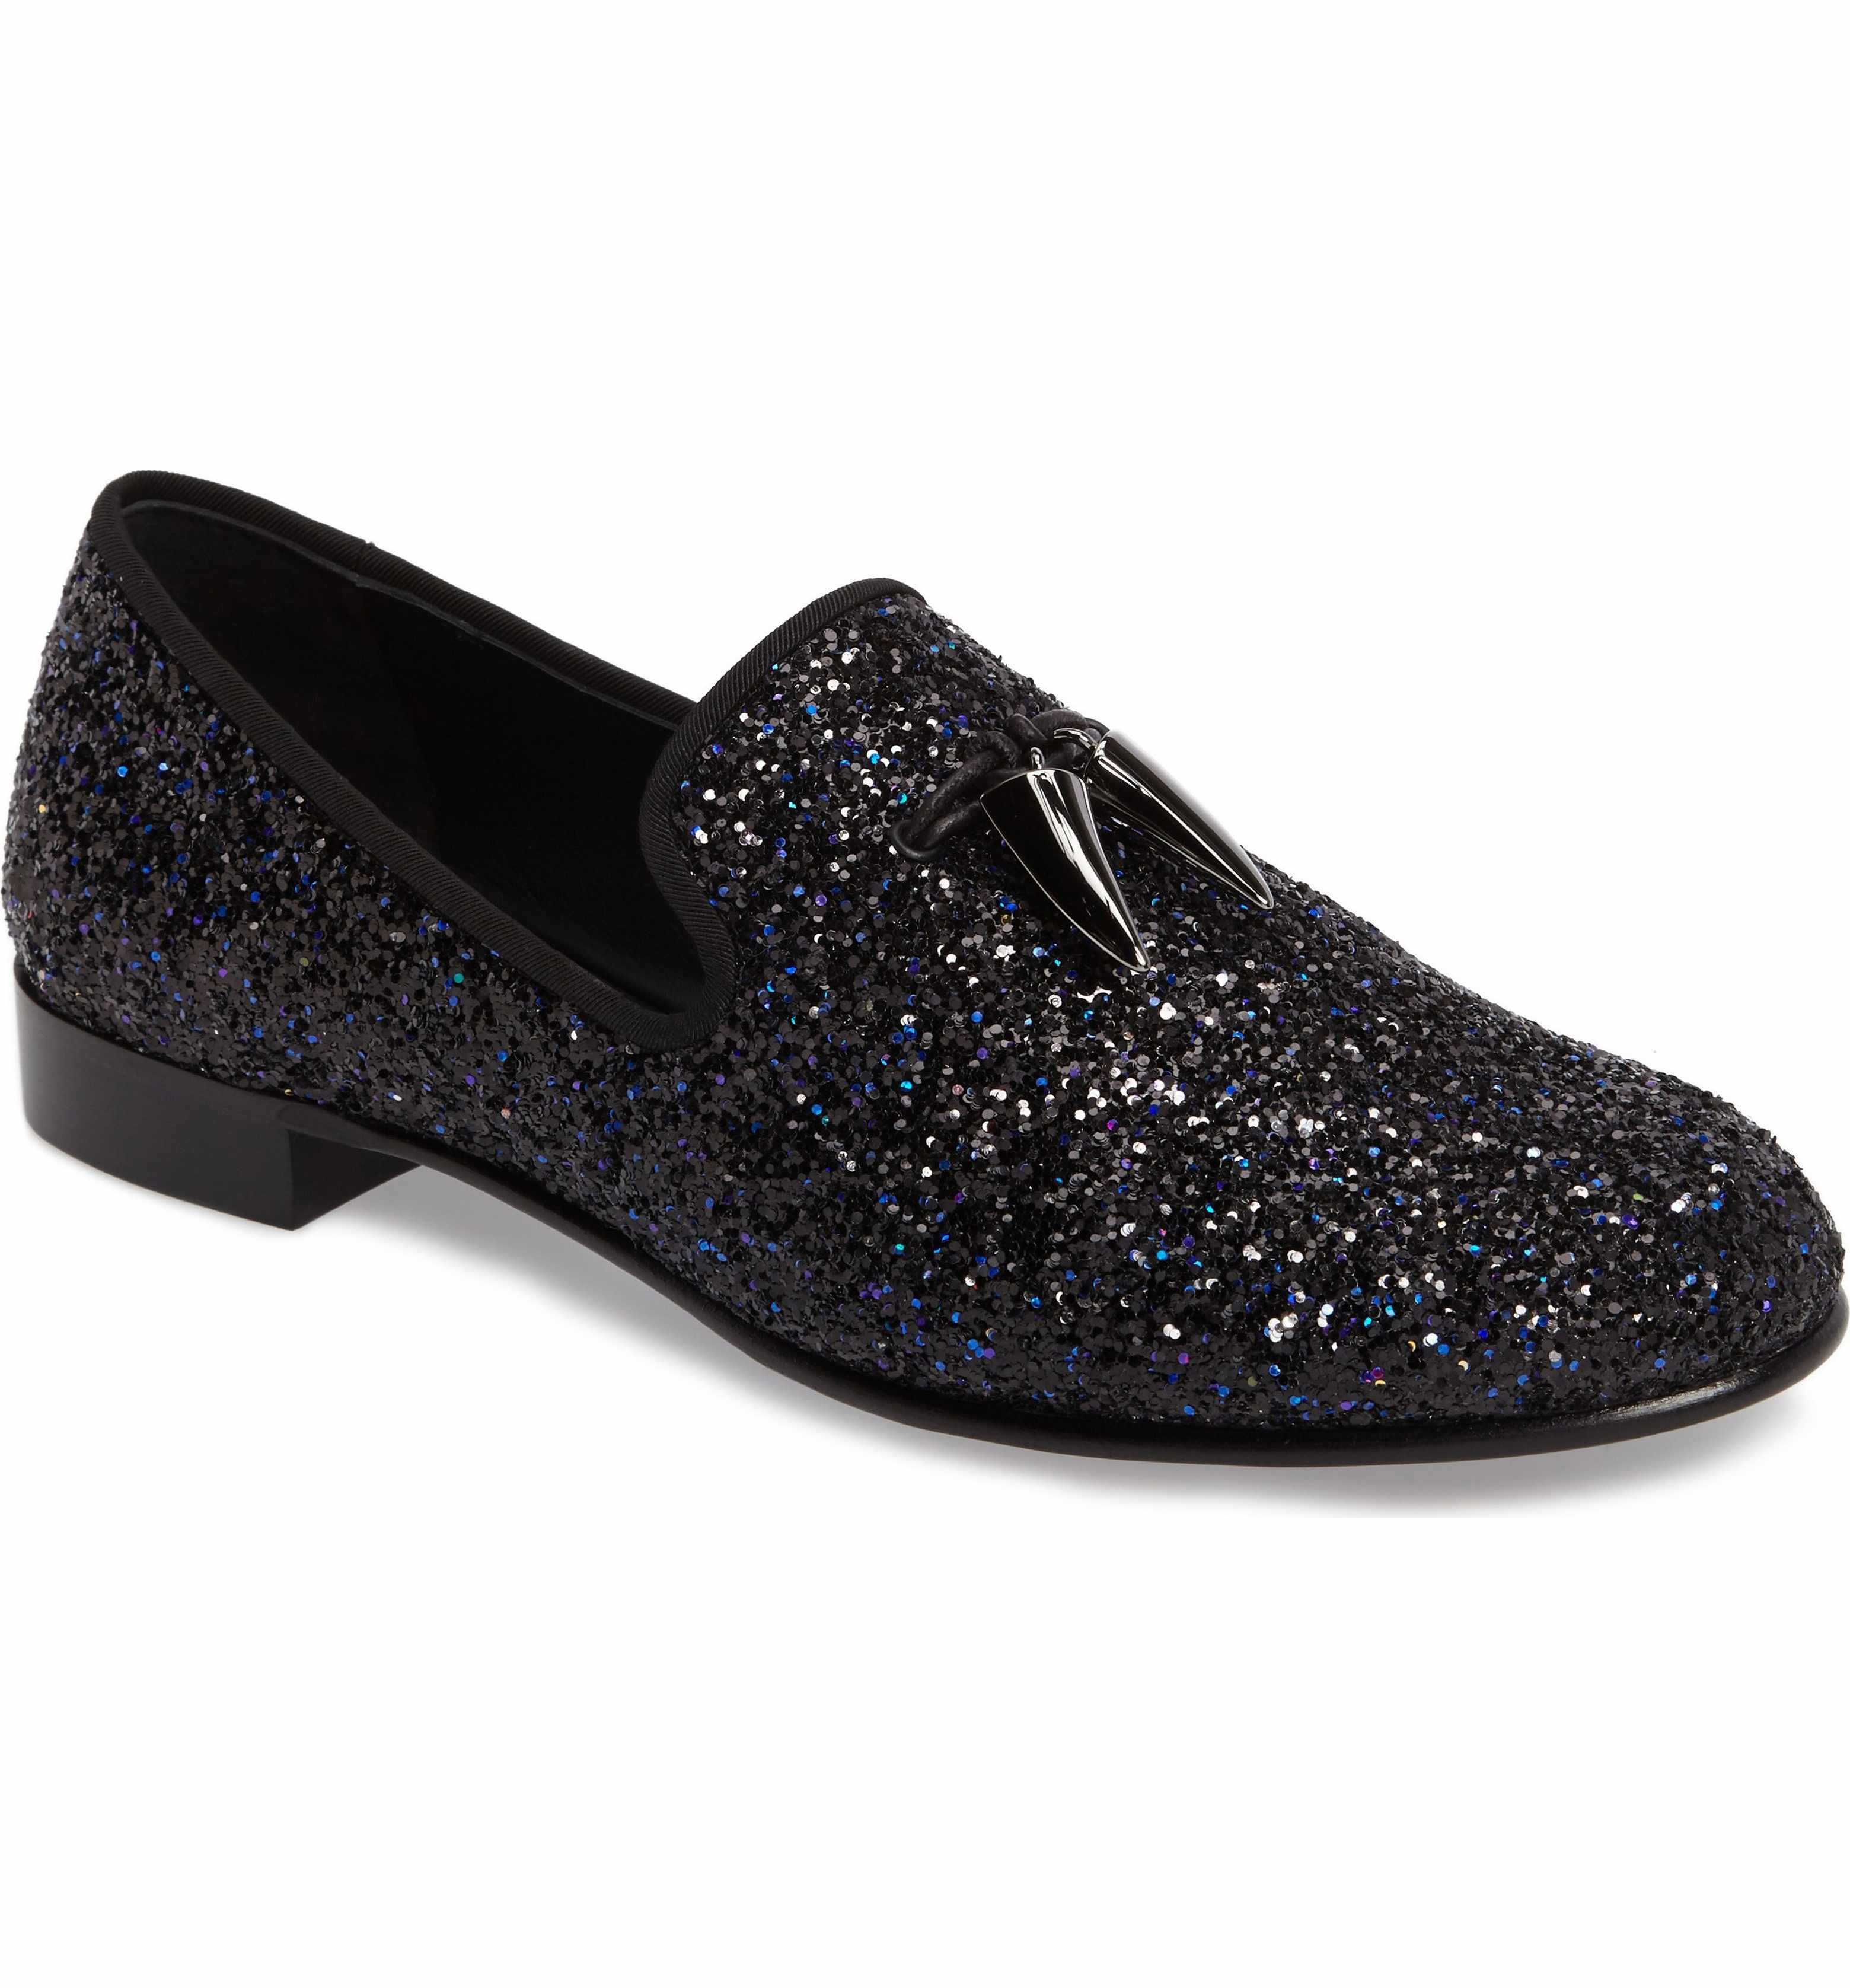 Pin on Men Dress Shoes and stylish Fashions